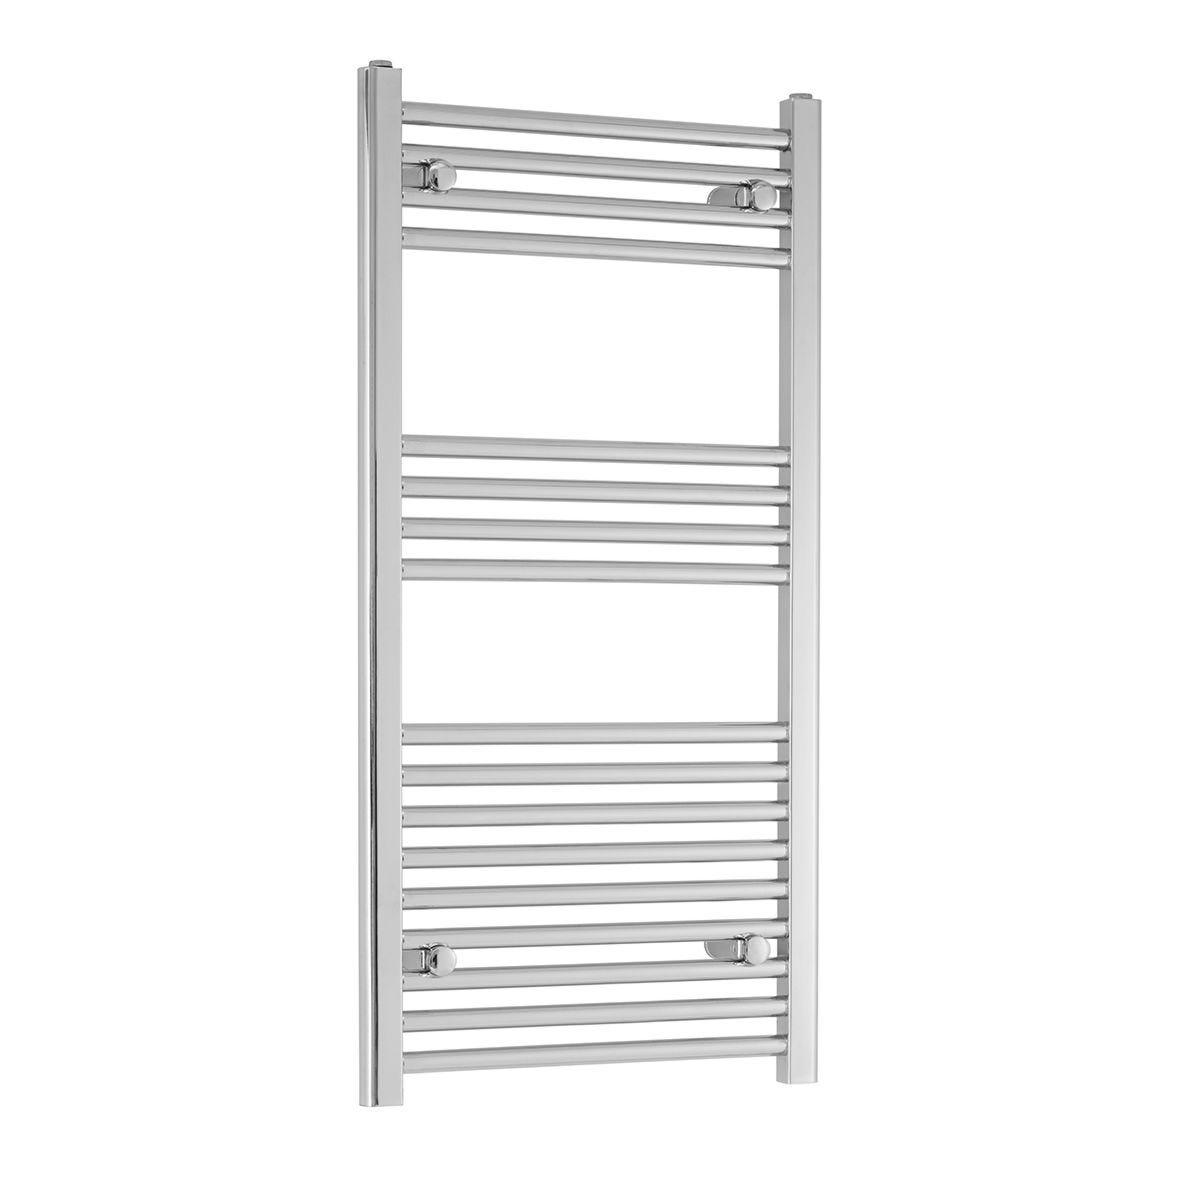 Heating Style Blythe Ladder Rail 1600x400mm Straight - Chrome